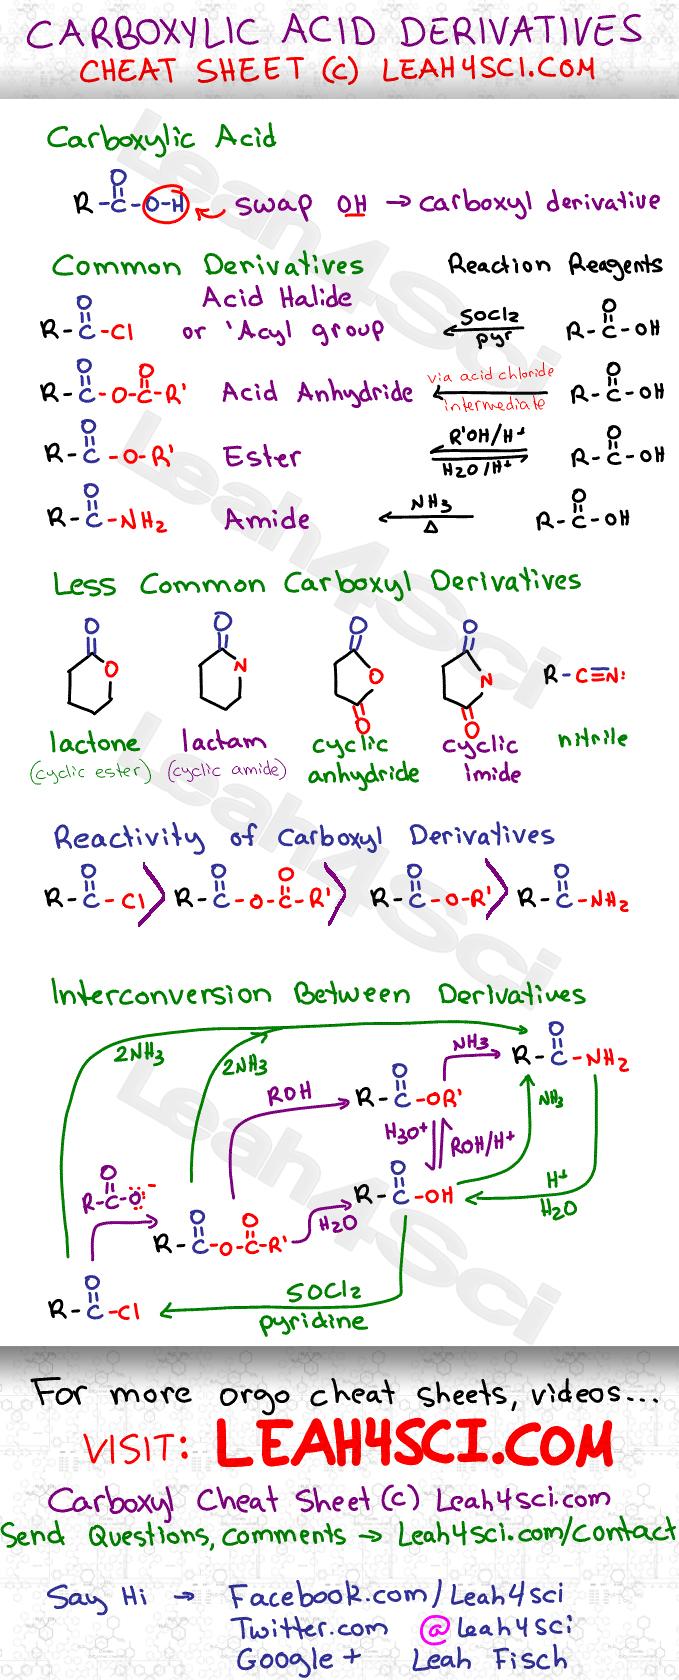 Photo of Carboxylic Acid Derivatives